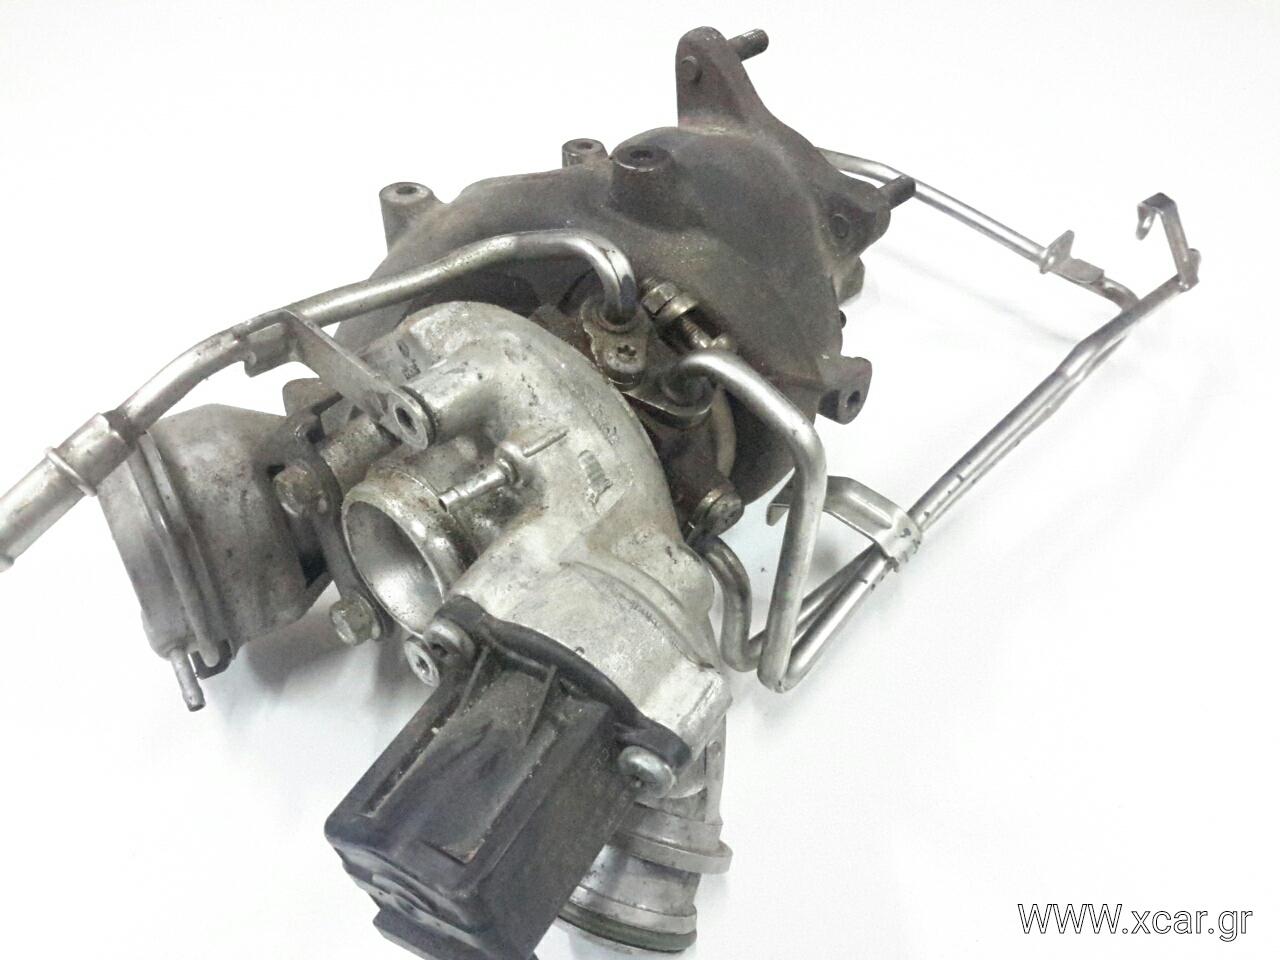 Turbo-Τουρμπίνα VW GOLF Hatchback / 3dr 2004 - 2008 ( Mk5  } 1400  ( CAXA  }  Petrol  122  TSI #TD025M207T23